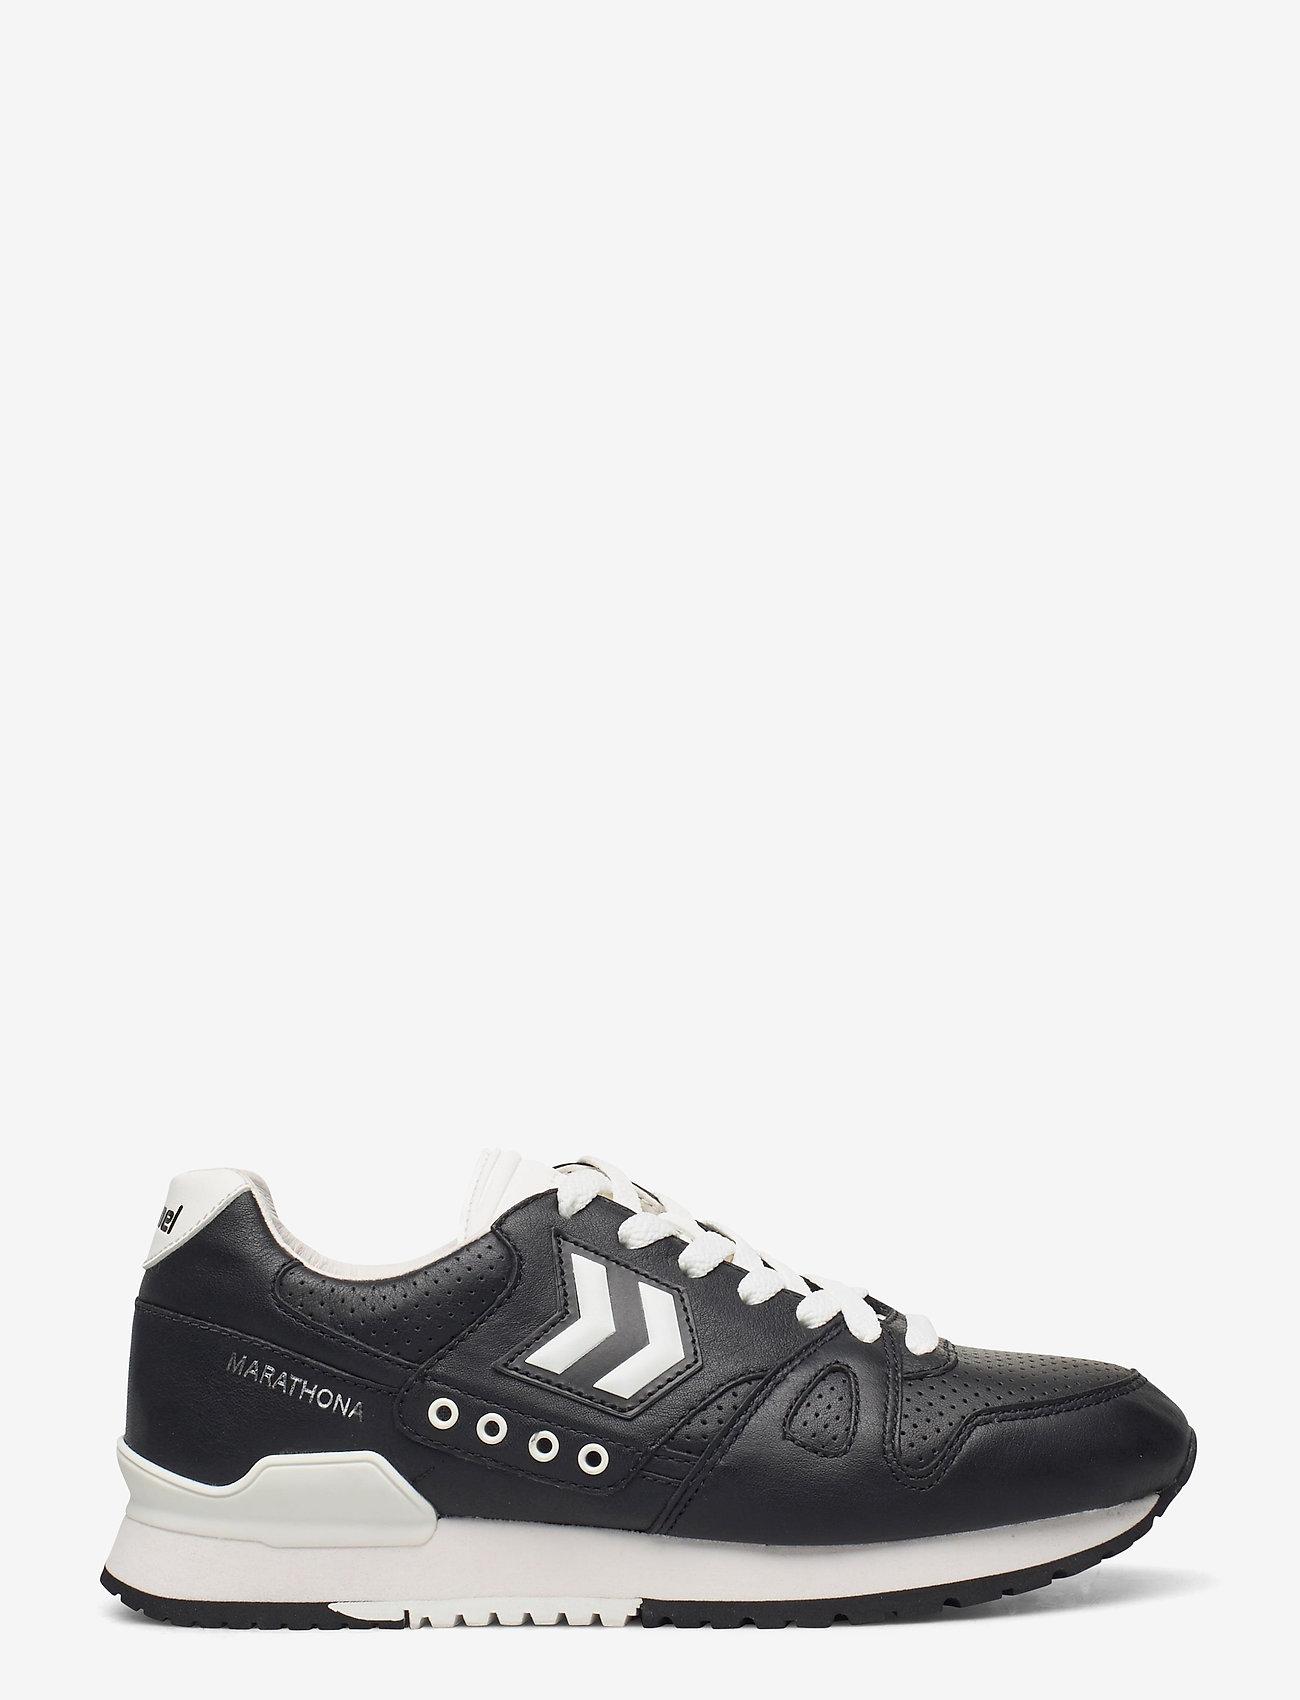 Hummel - MARATHONA OG CLASSIC FOOTBALL - laag sneakers - black - 0